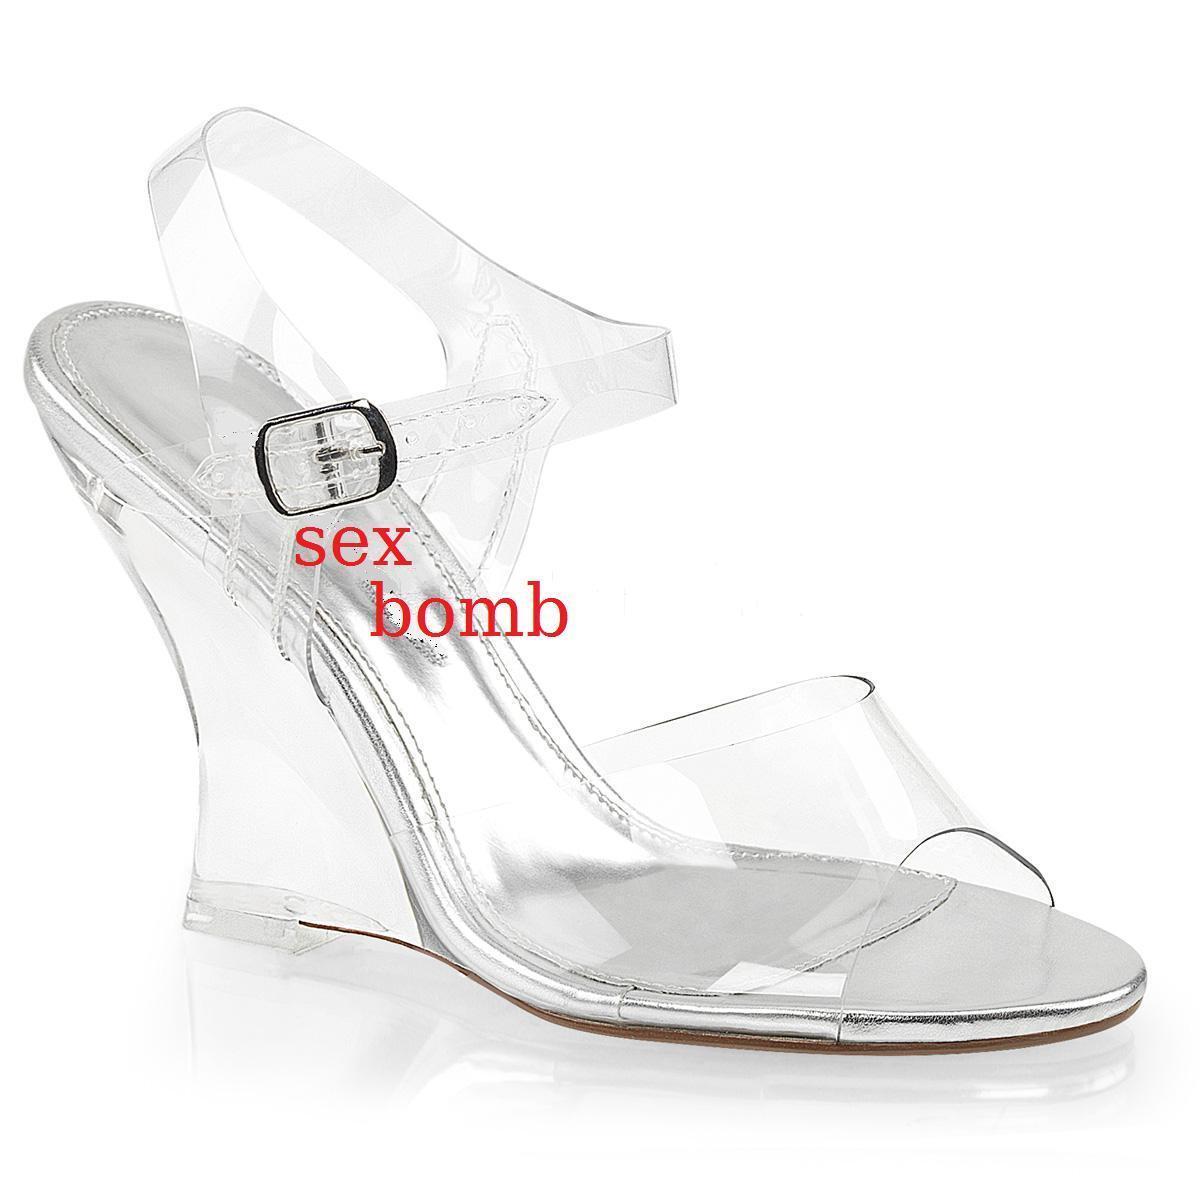 SEXY sandali ZEPPA tacco tacco tacco 10 dal 35 al 42 TRASPARENTE cinturino zapatos GLAMOUR  n ° 1 en línea